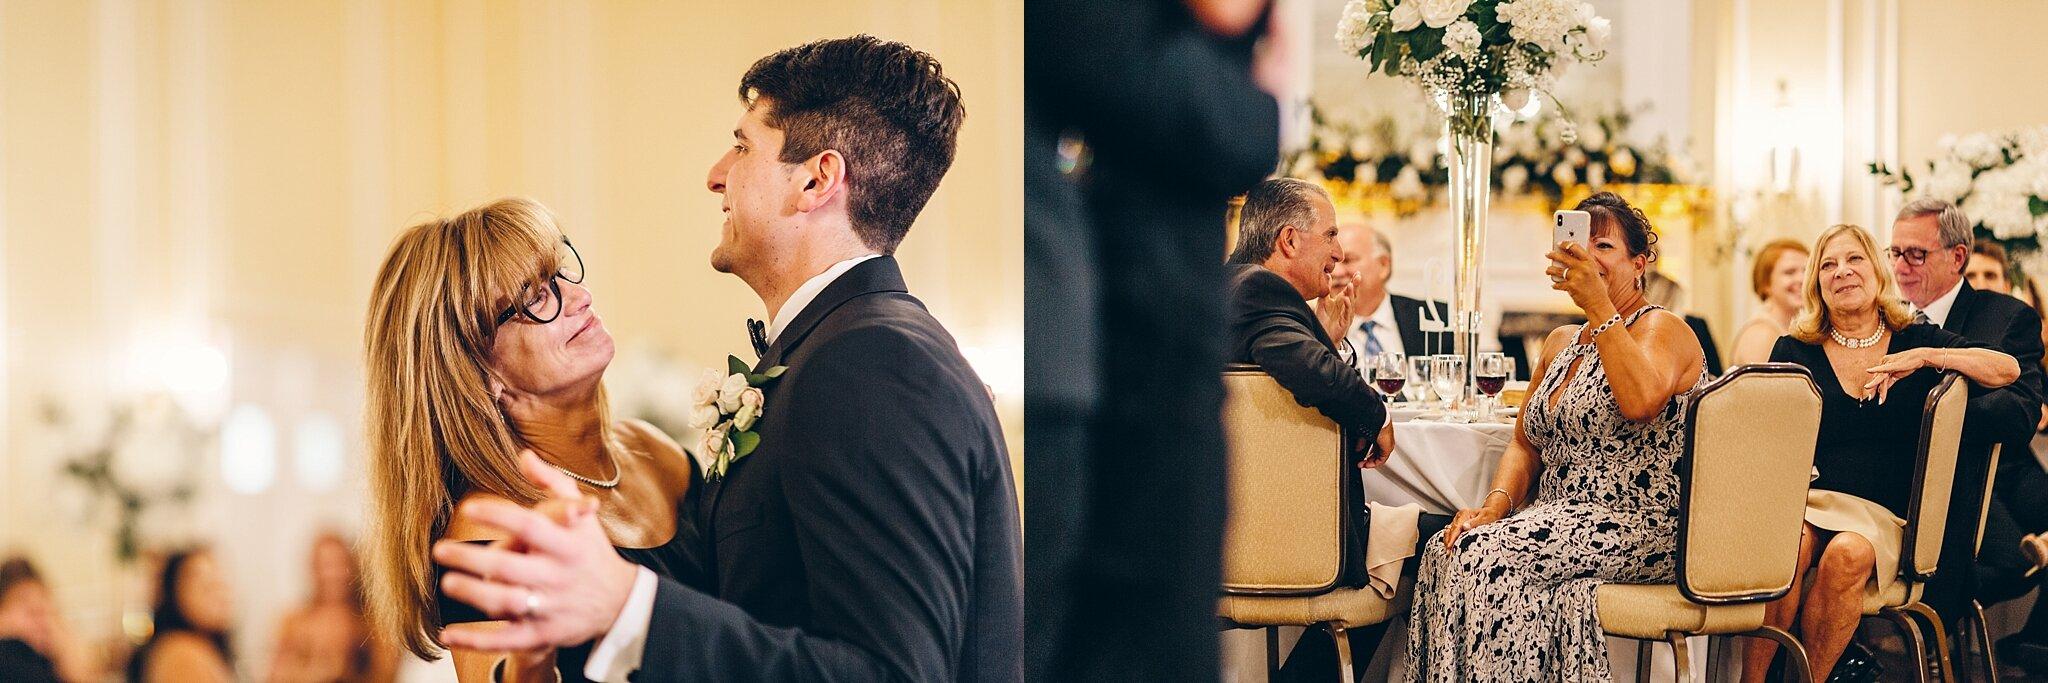 patrick-henry-ballroom-wedding-roanoke_0531.jpg